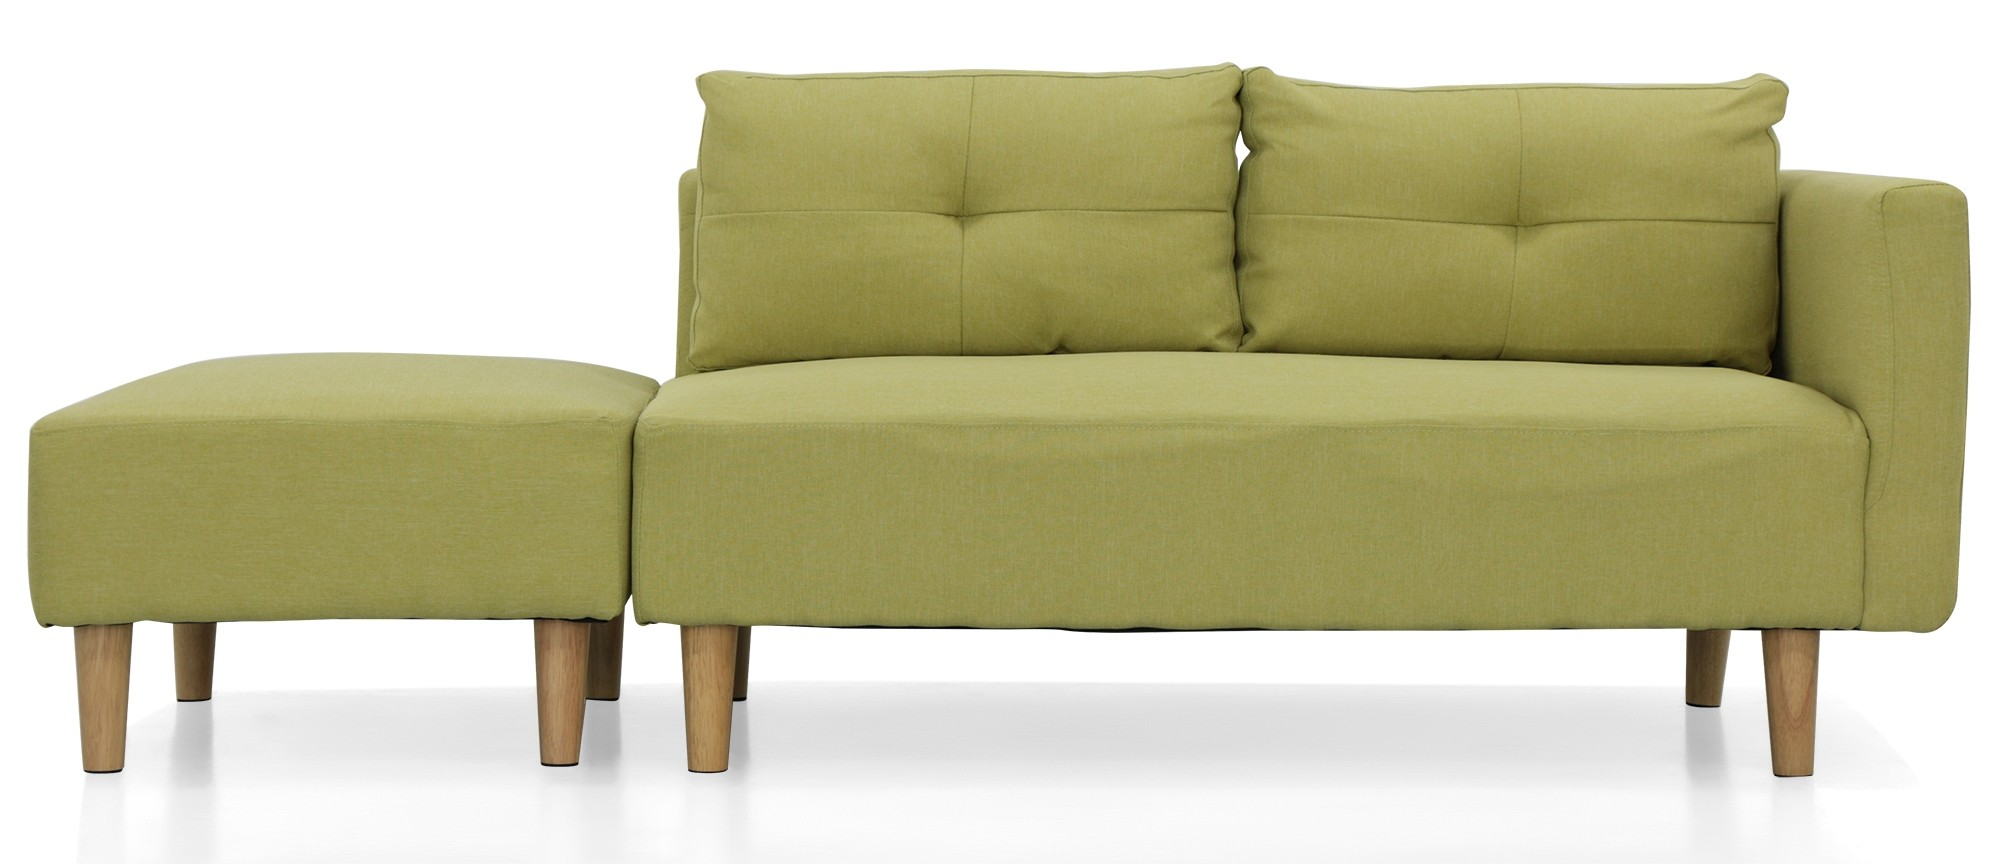 Nala Left Corner Sofa With Ottoman Green Furniture Home Decor